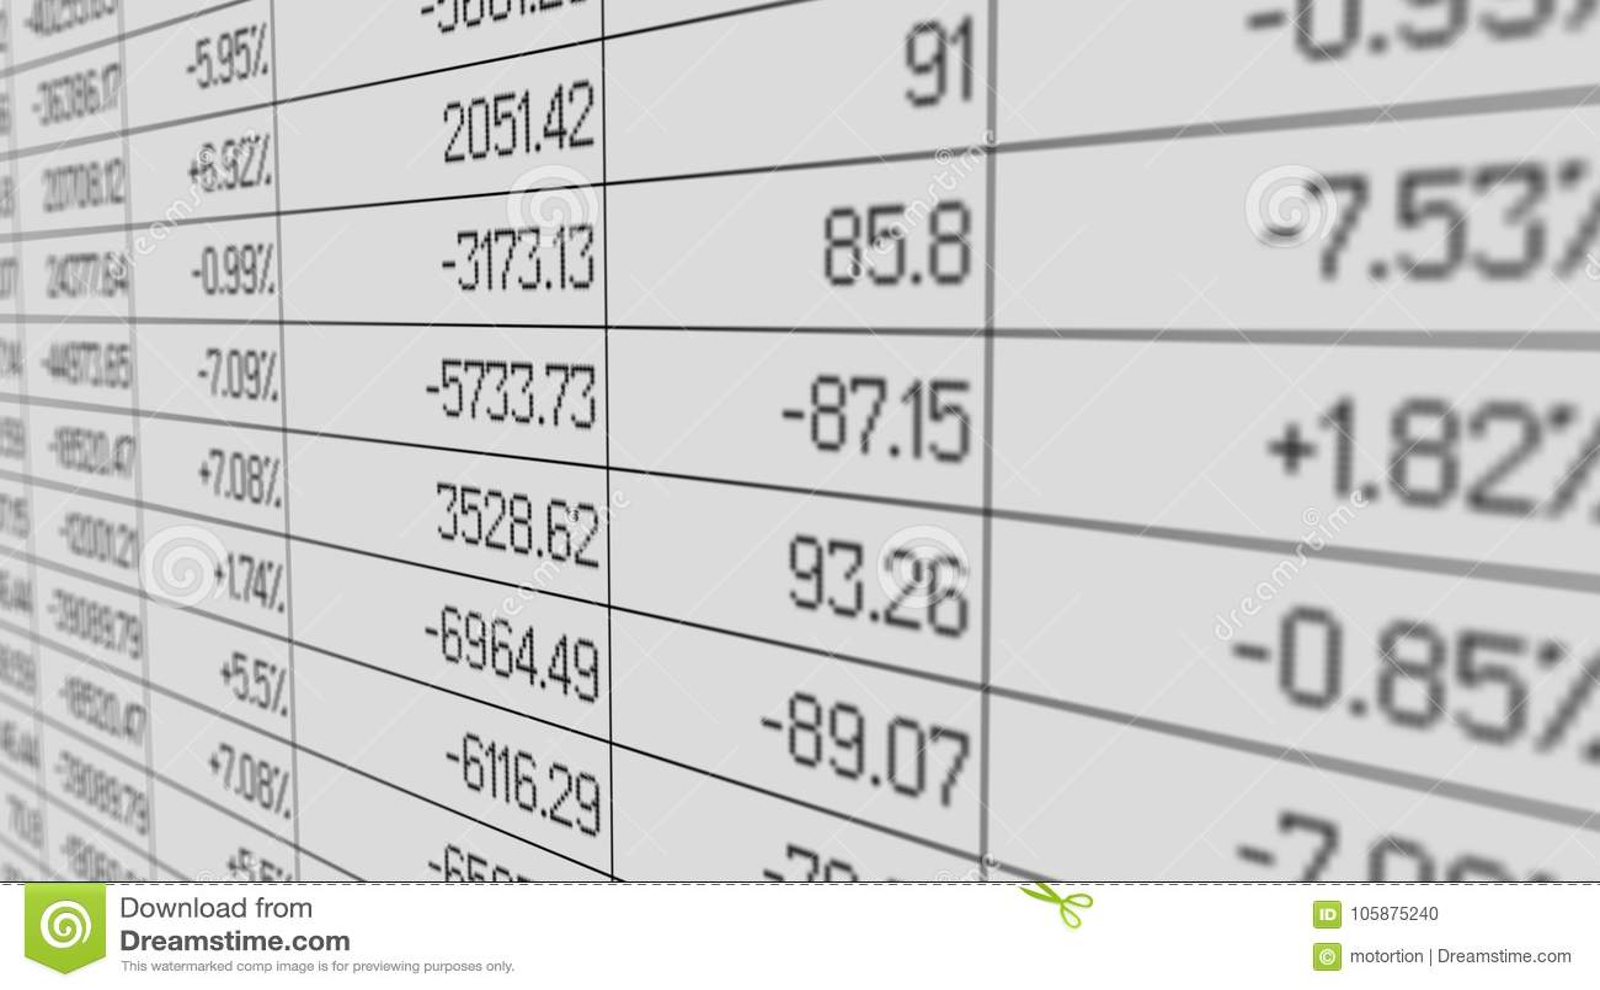 Government Debt Shown In Financial Statistics Spreadsheet